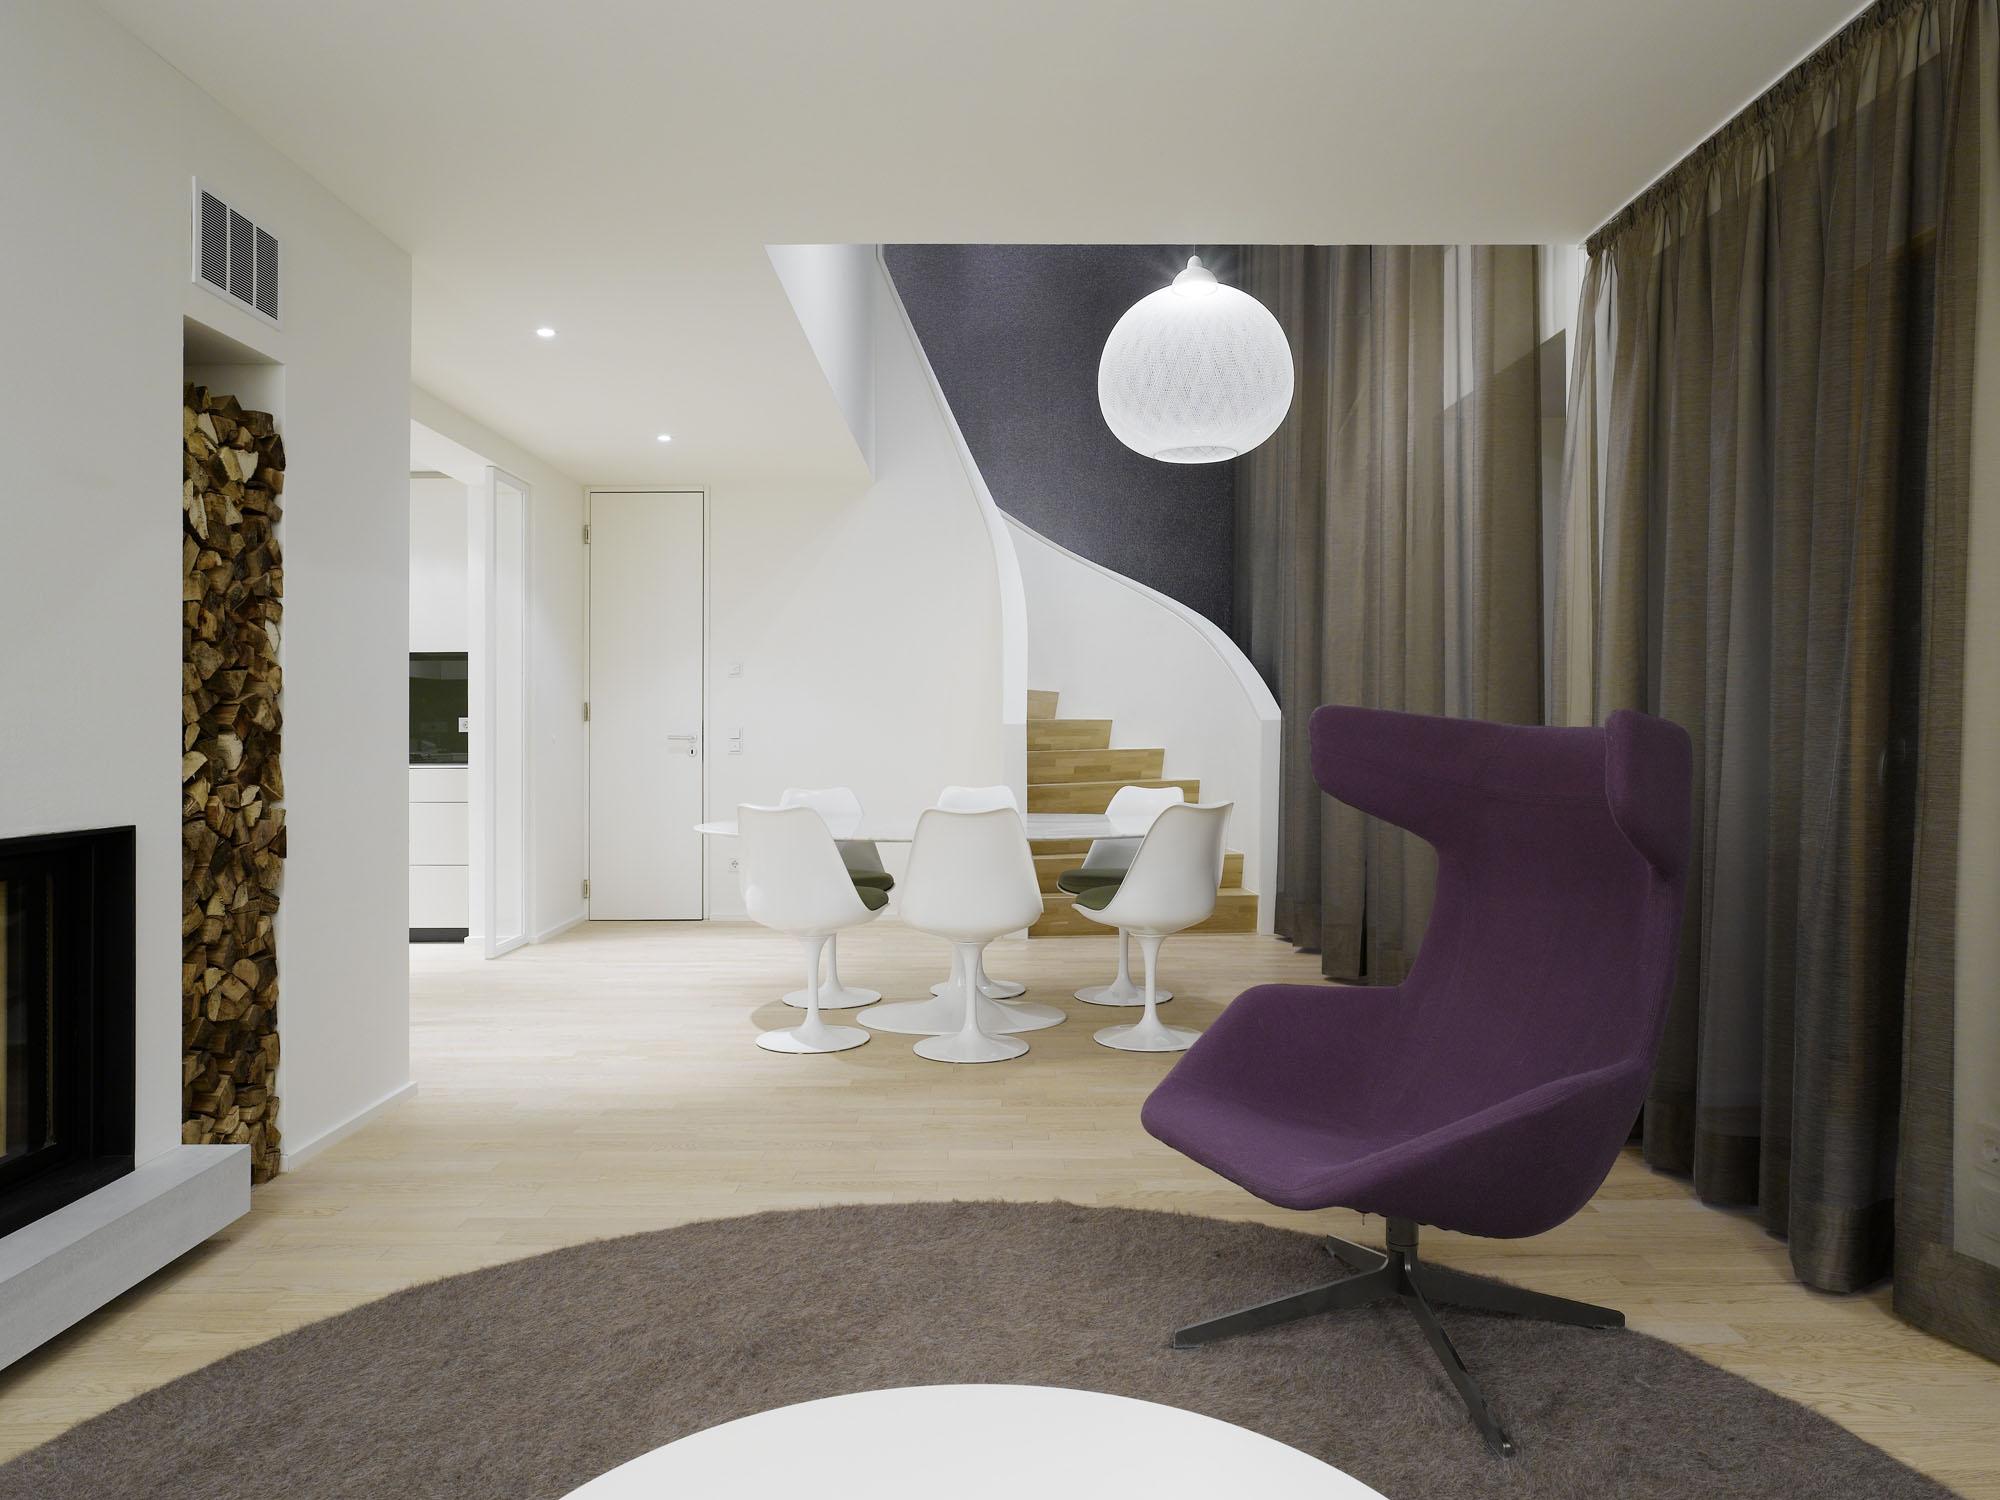 Ippolito Fleitz quant 1 apartment by ippolito fleitz